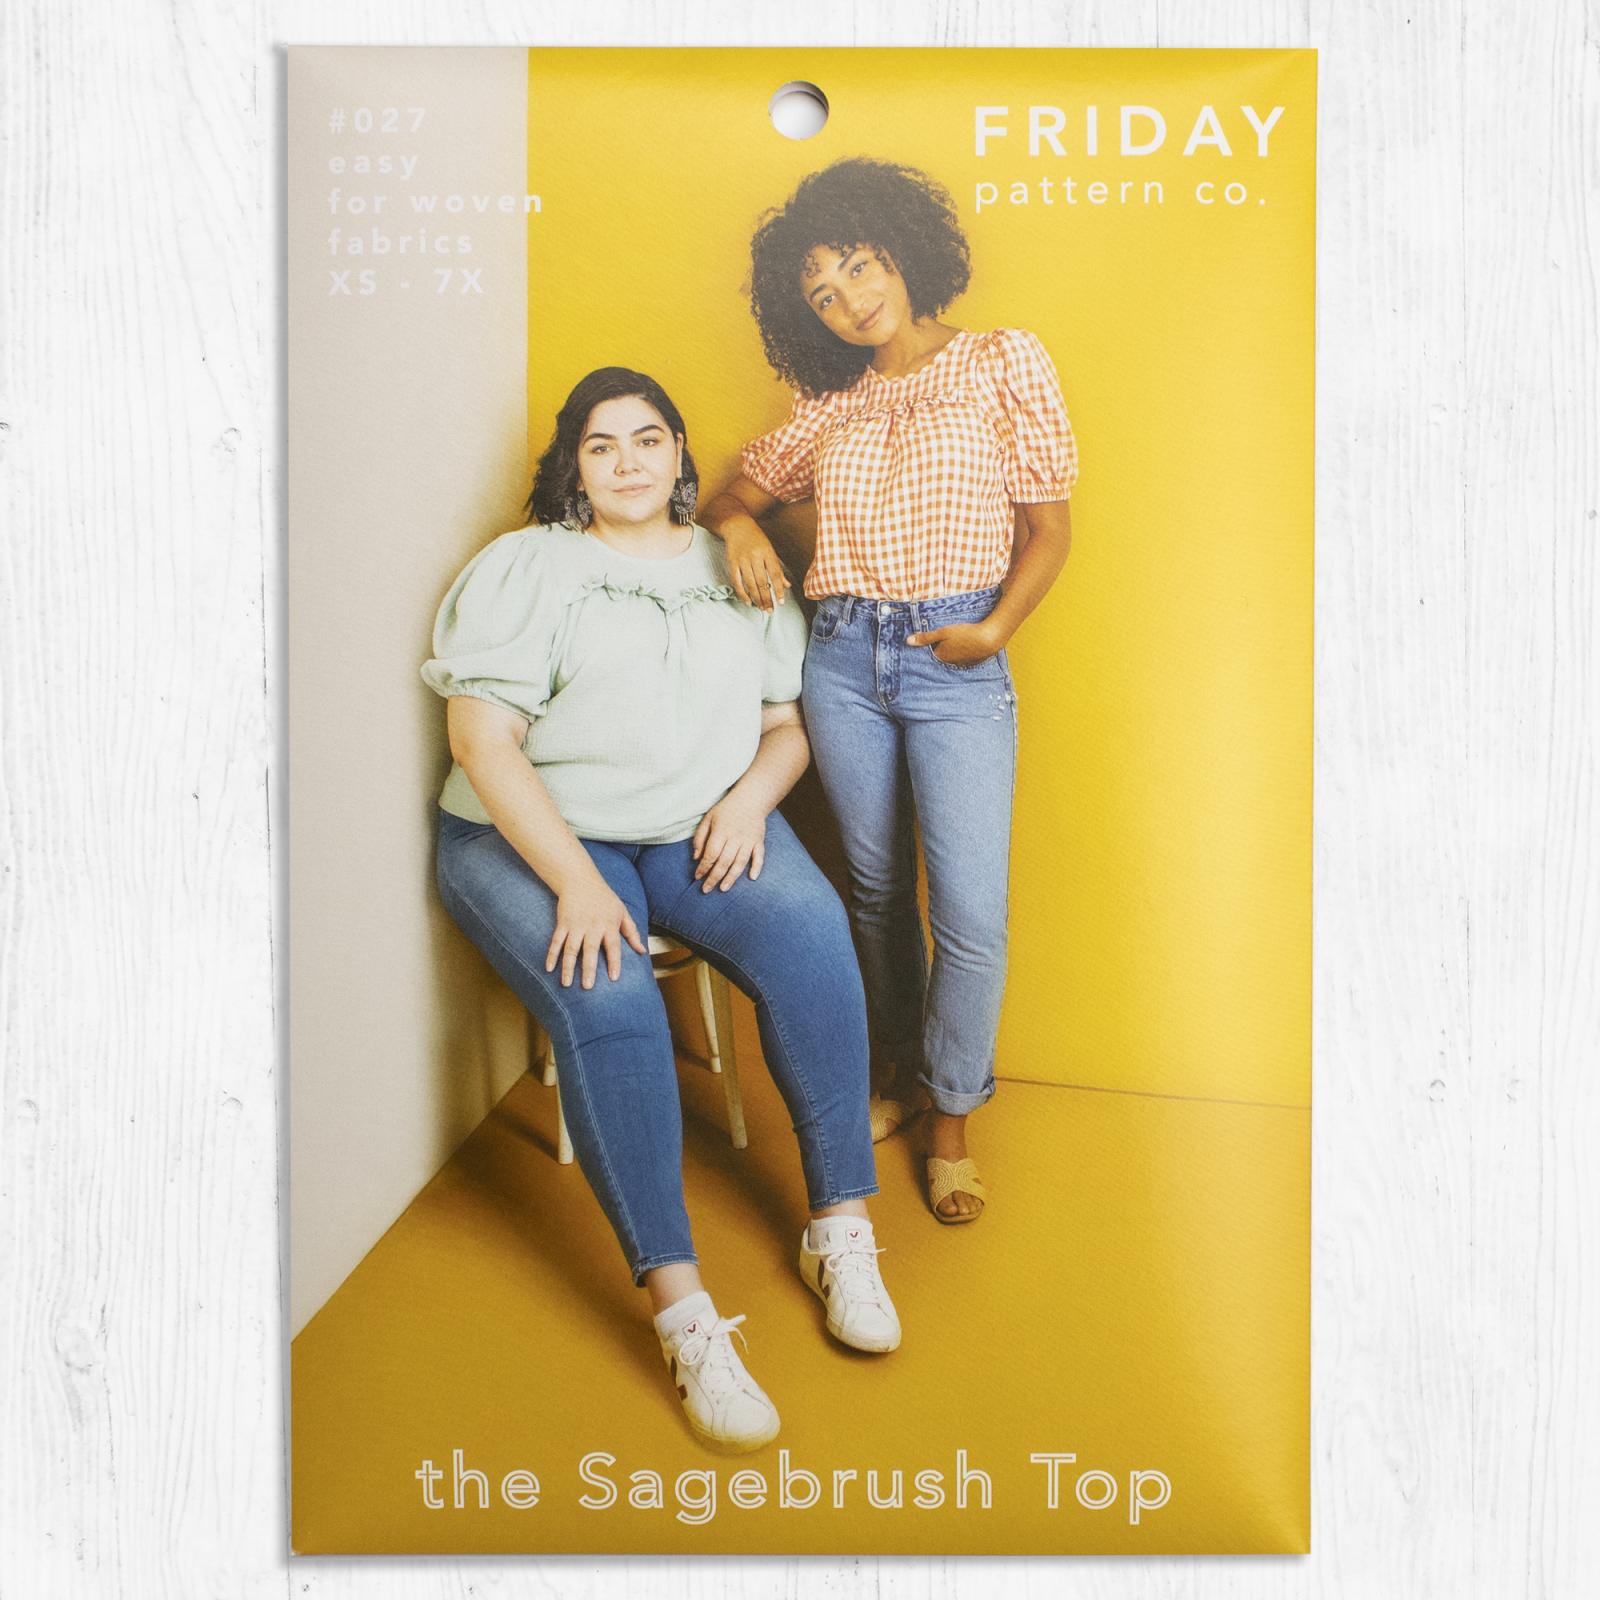 Friday Pattern Co. - Sagebrush Top